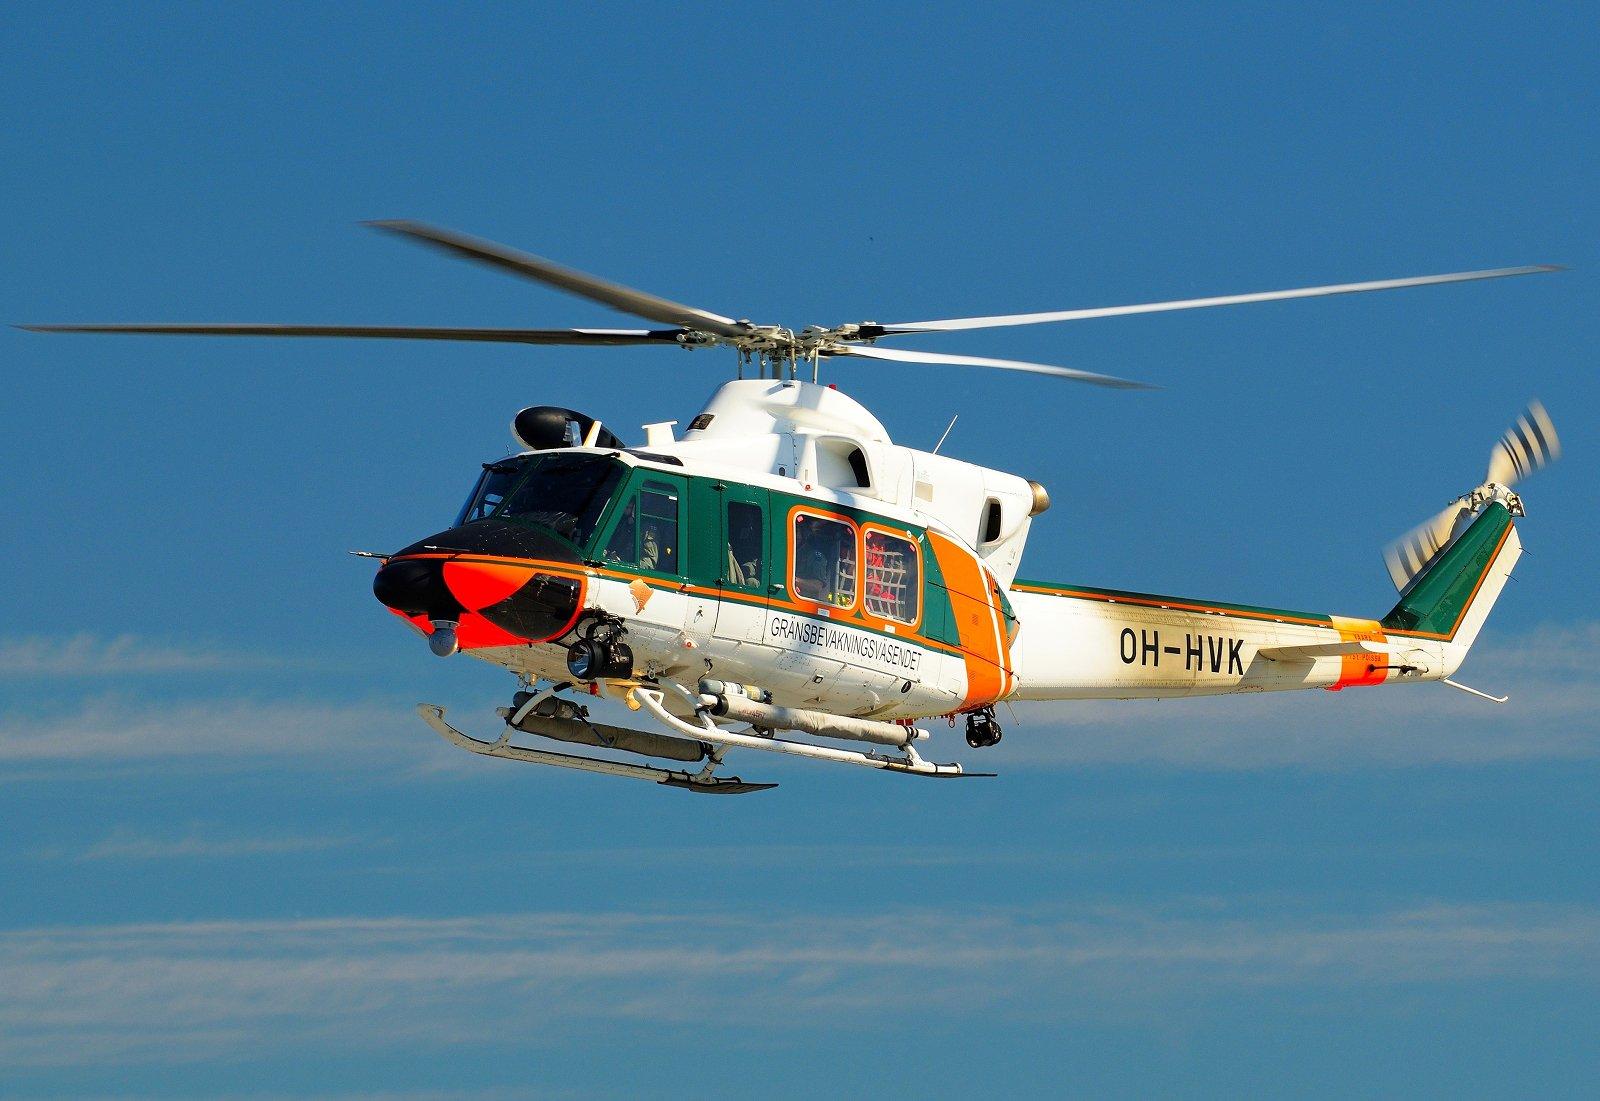 OH-HVK - Agusta-Bell AB-412EP - Rajavartiolaitos - 9.8.2020